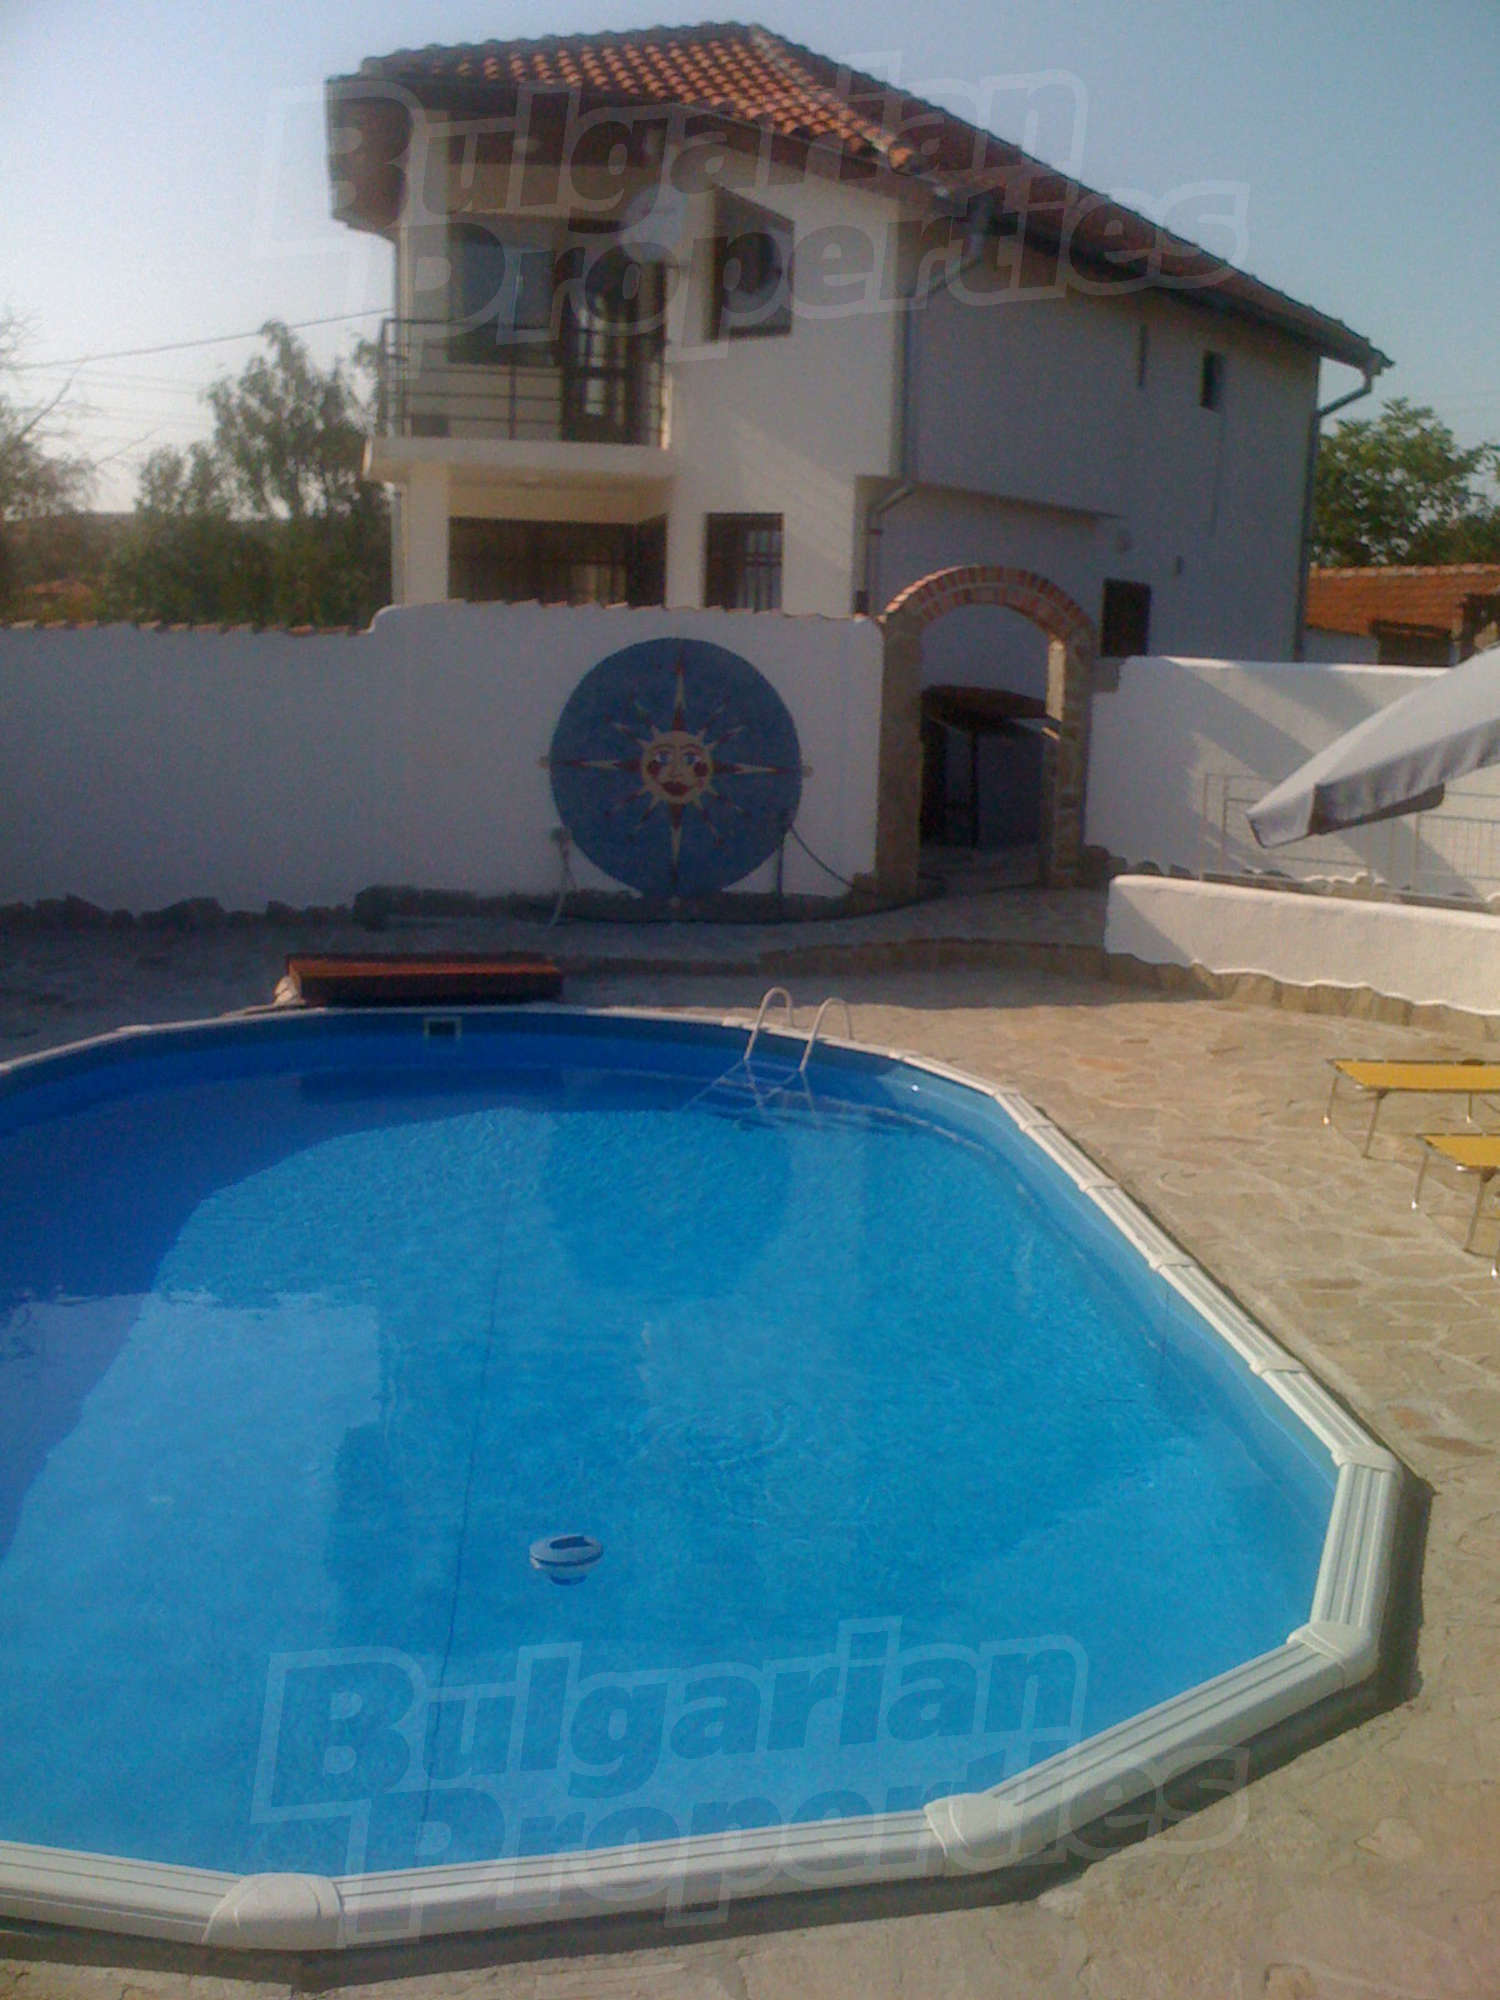 House For Sale Near Burgas Bulgaria New House With